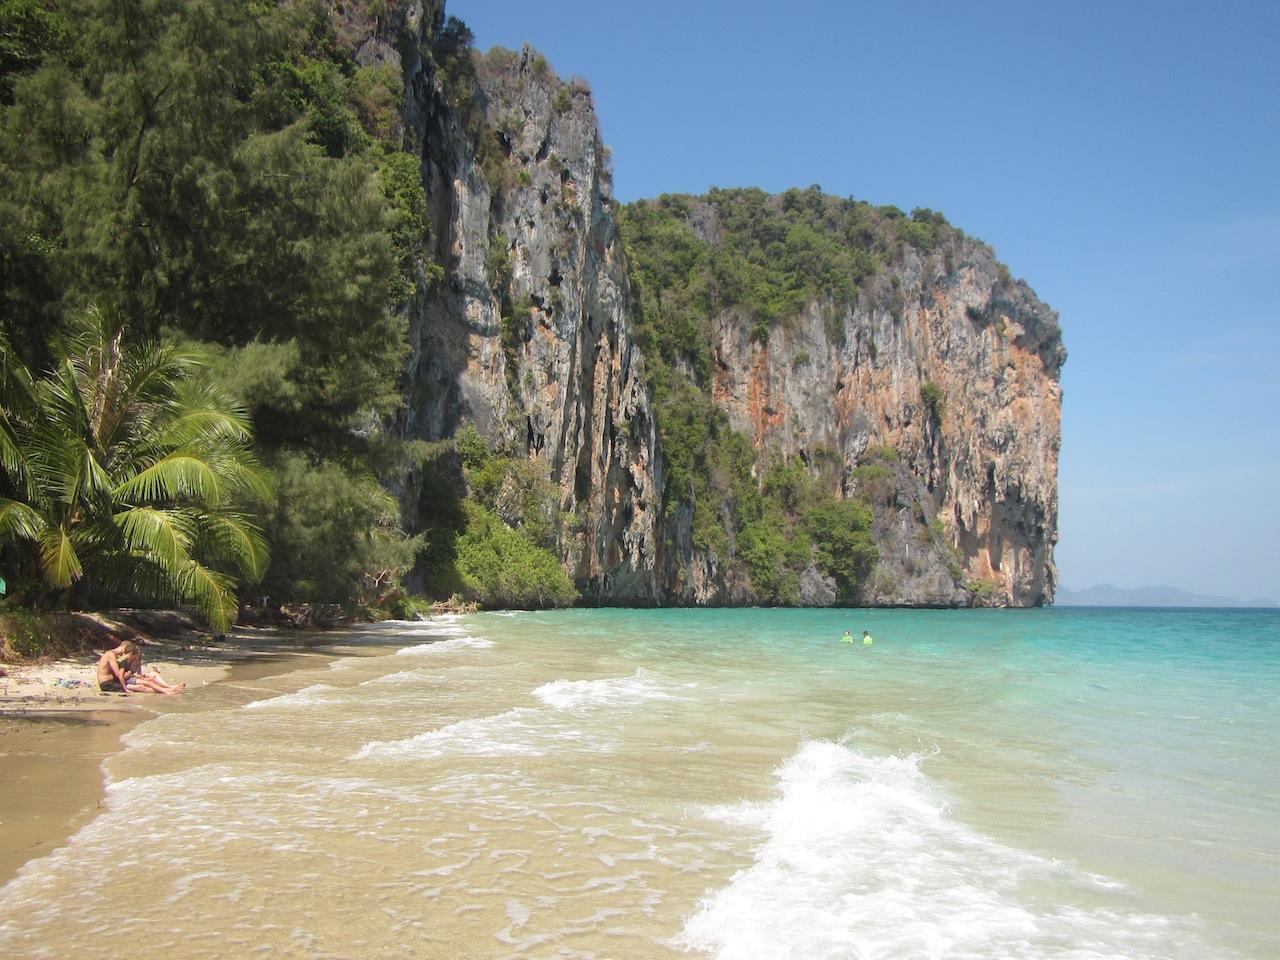 01 Camping thailand beach - Koh Laoliang